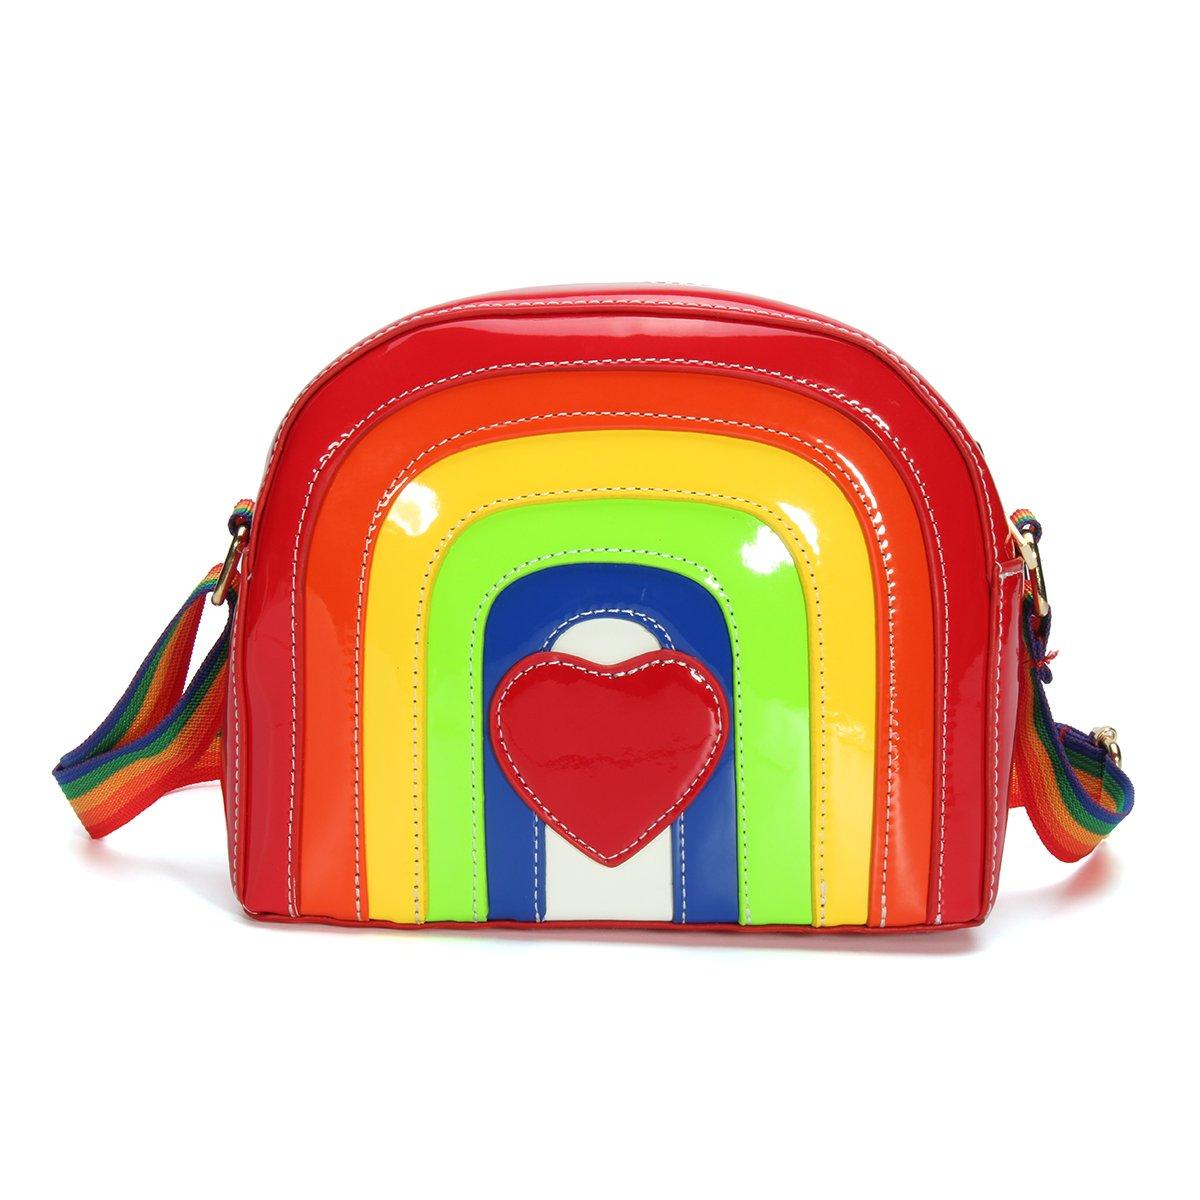 OURBAG Cute Women Rainbow Colors Stripes Messenger Bag Shoulder Bag PU Leather Handbag Rainbow